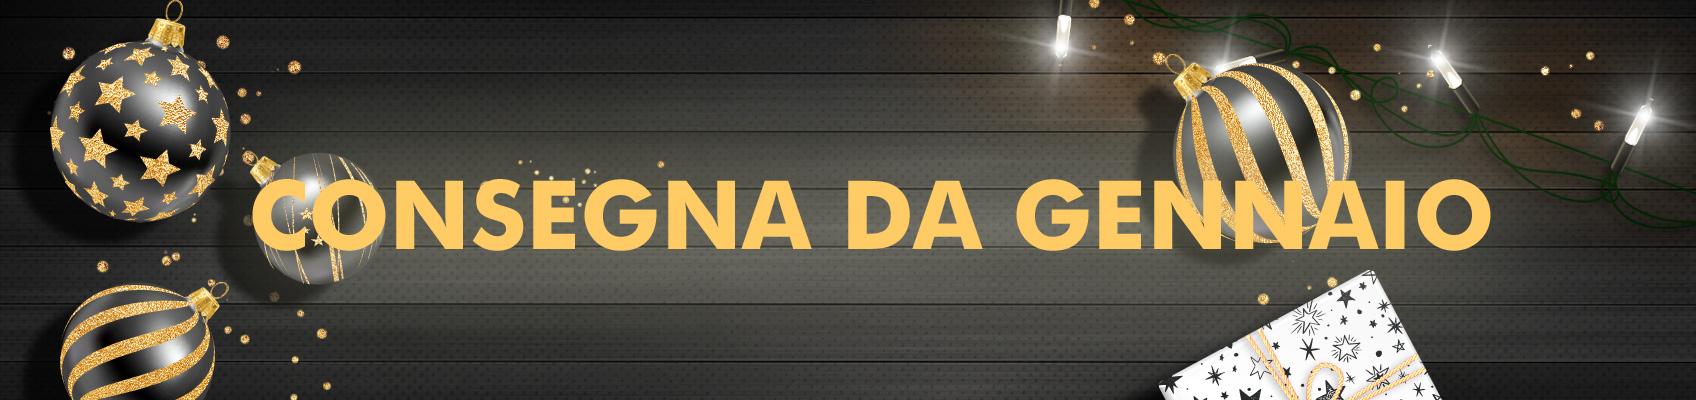 Banner homepage natale 2018